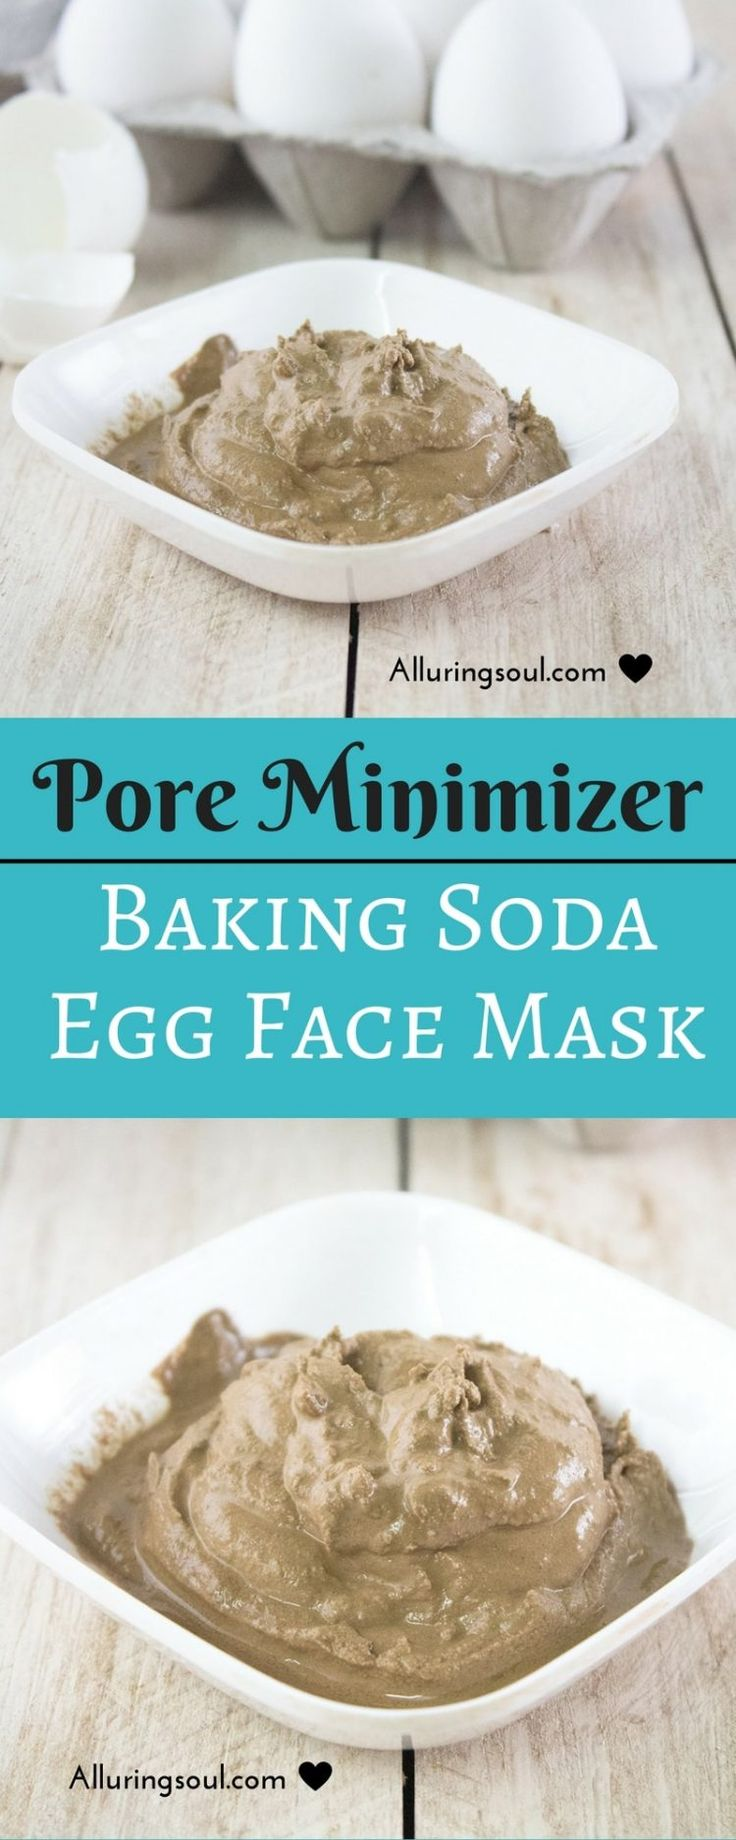 Pore Minimizer Baking Soda And Egg Face Mask